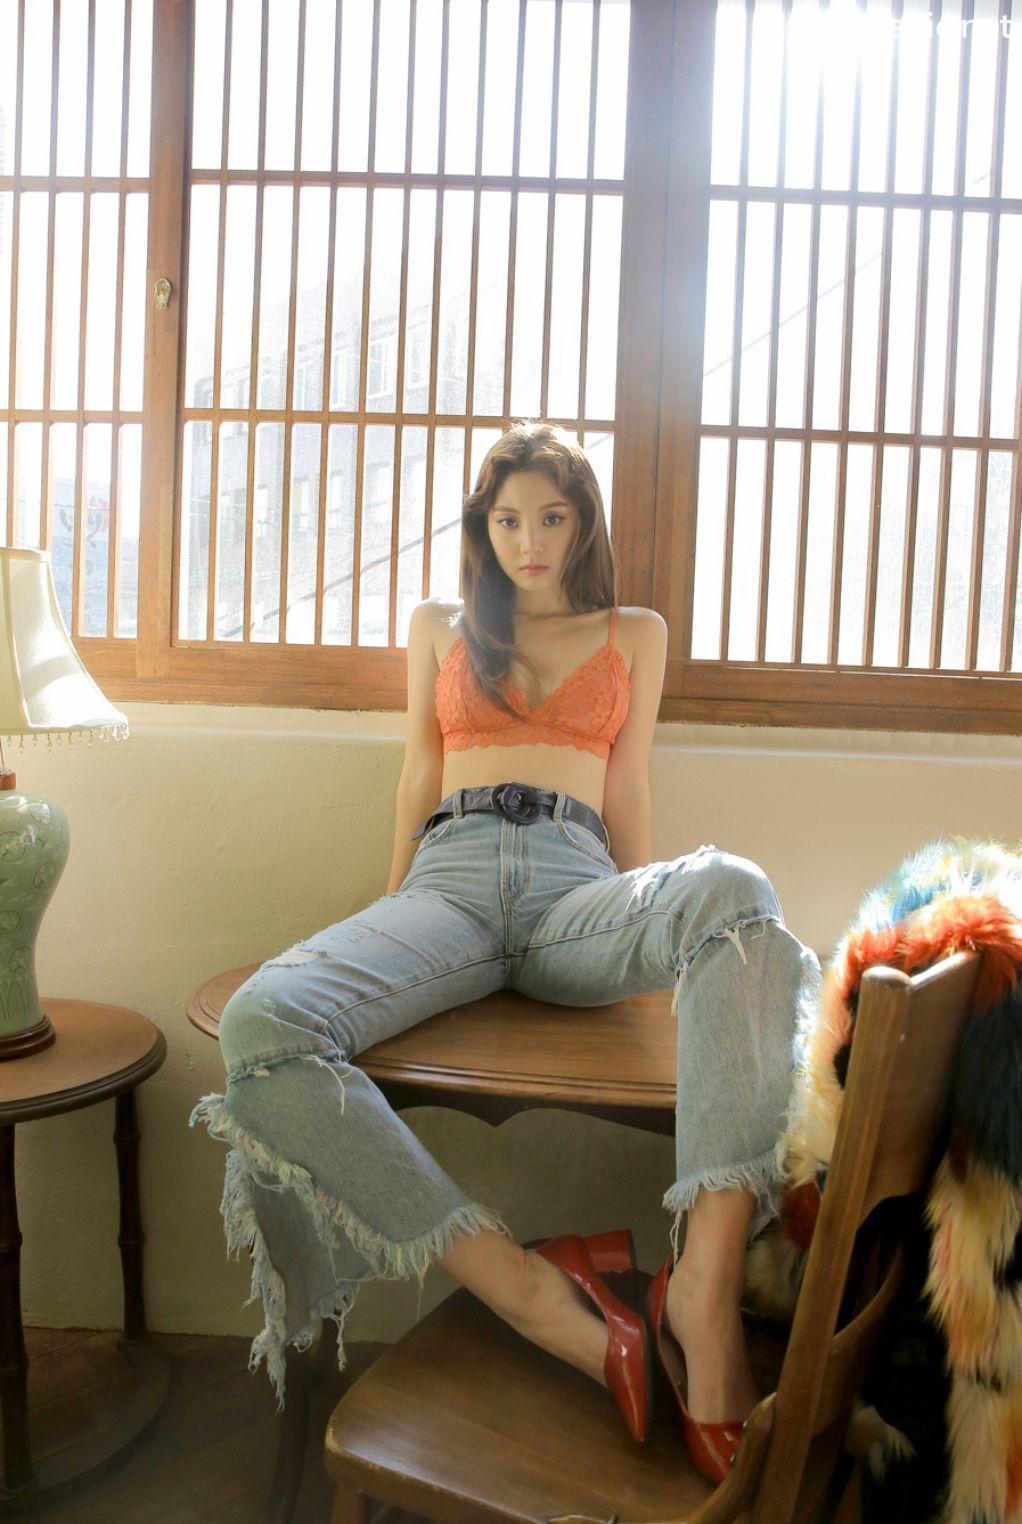 Image-Korean-Fashion-Model-Lee-Chae-Eun-7-Lingerie-Set-For-A-Week-TruePic.net- Picture-2